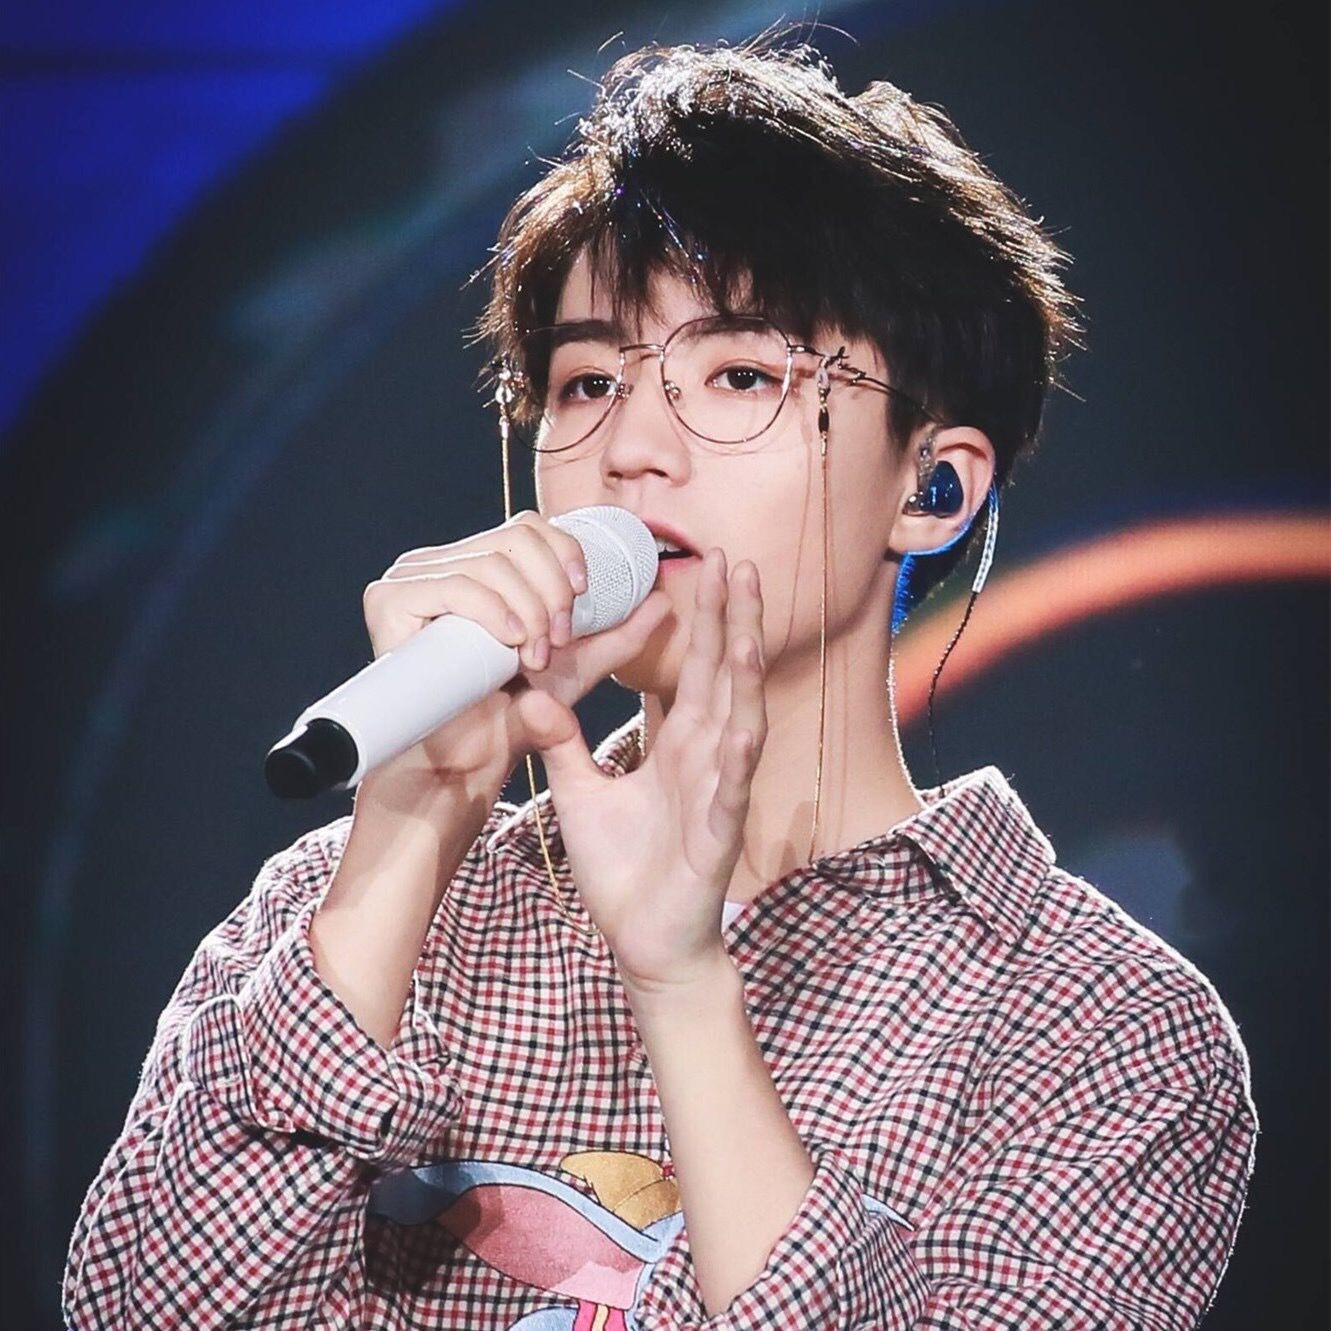 Wang Junkai Similar Glasses Student Myopia Glasses with Chain Men's and Women's Korean-Style round Face Retro Polygonal Flat Mirror U37g